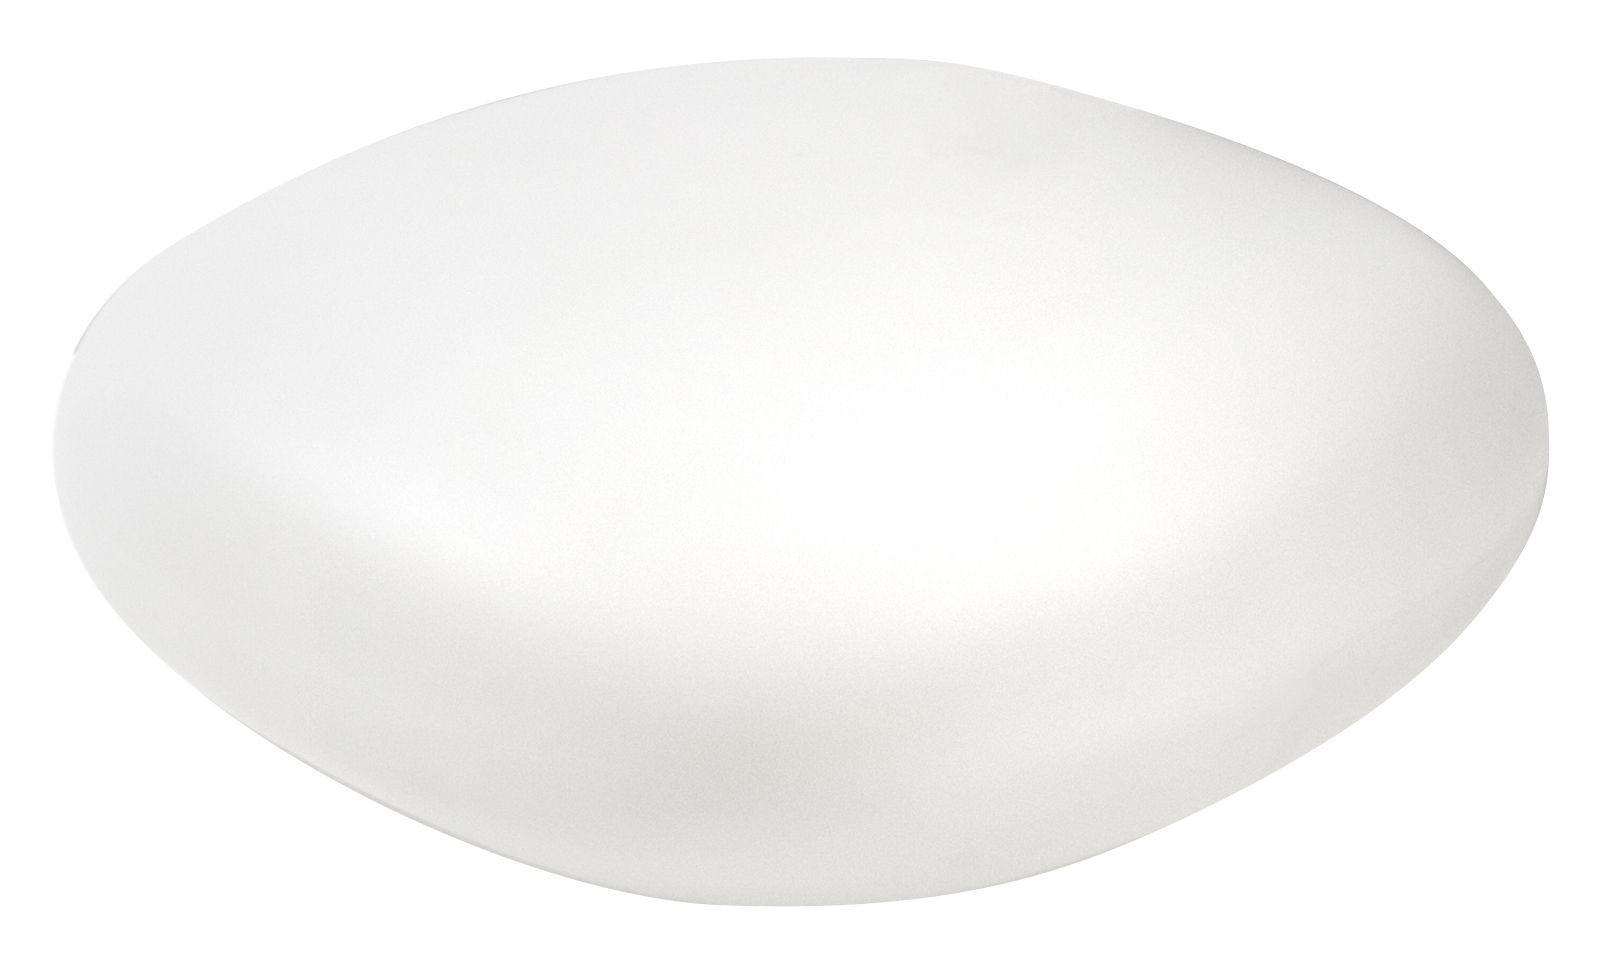 Arredamento - Tavolini  - Tavolino Chubby Low di Slide - Bianco - polietilene riciclabile